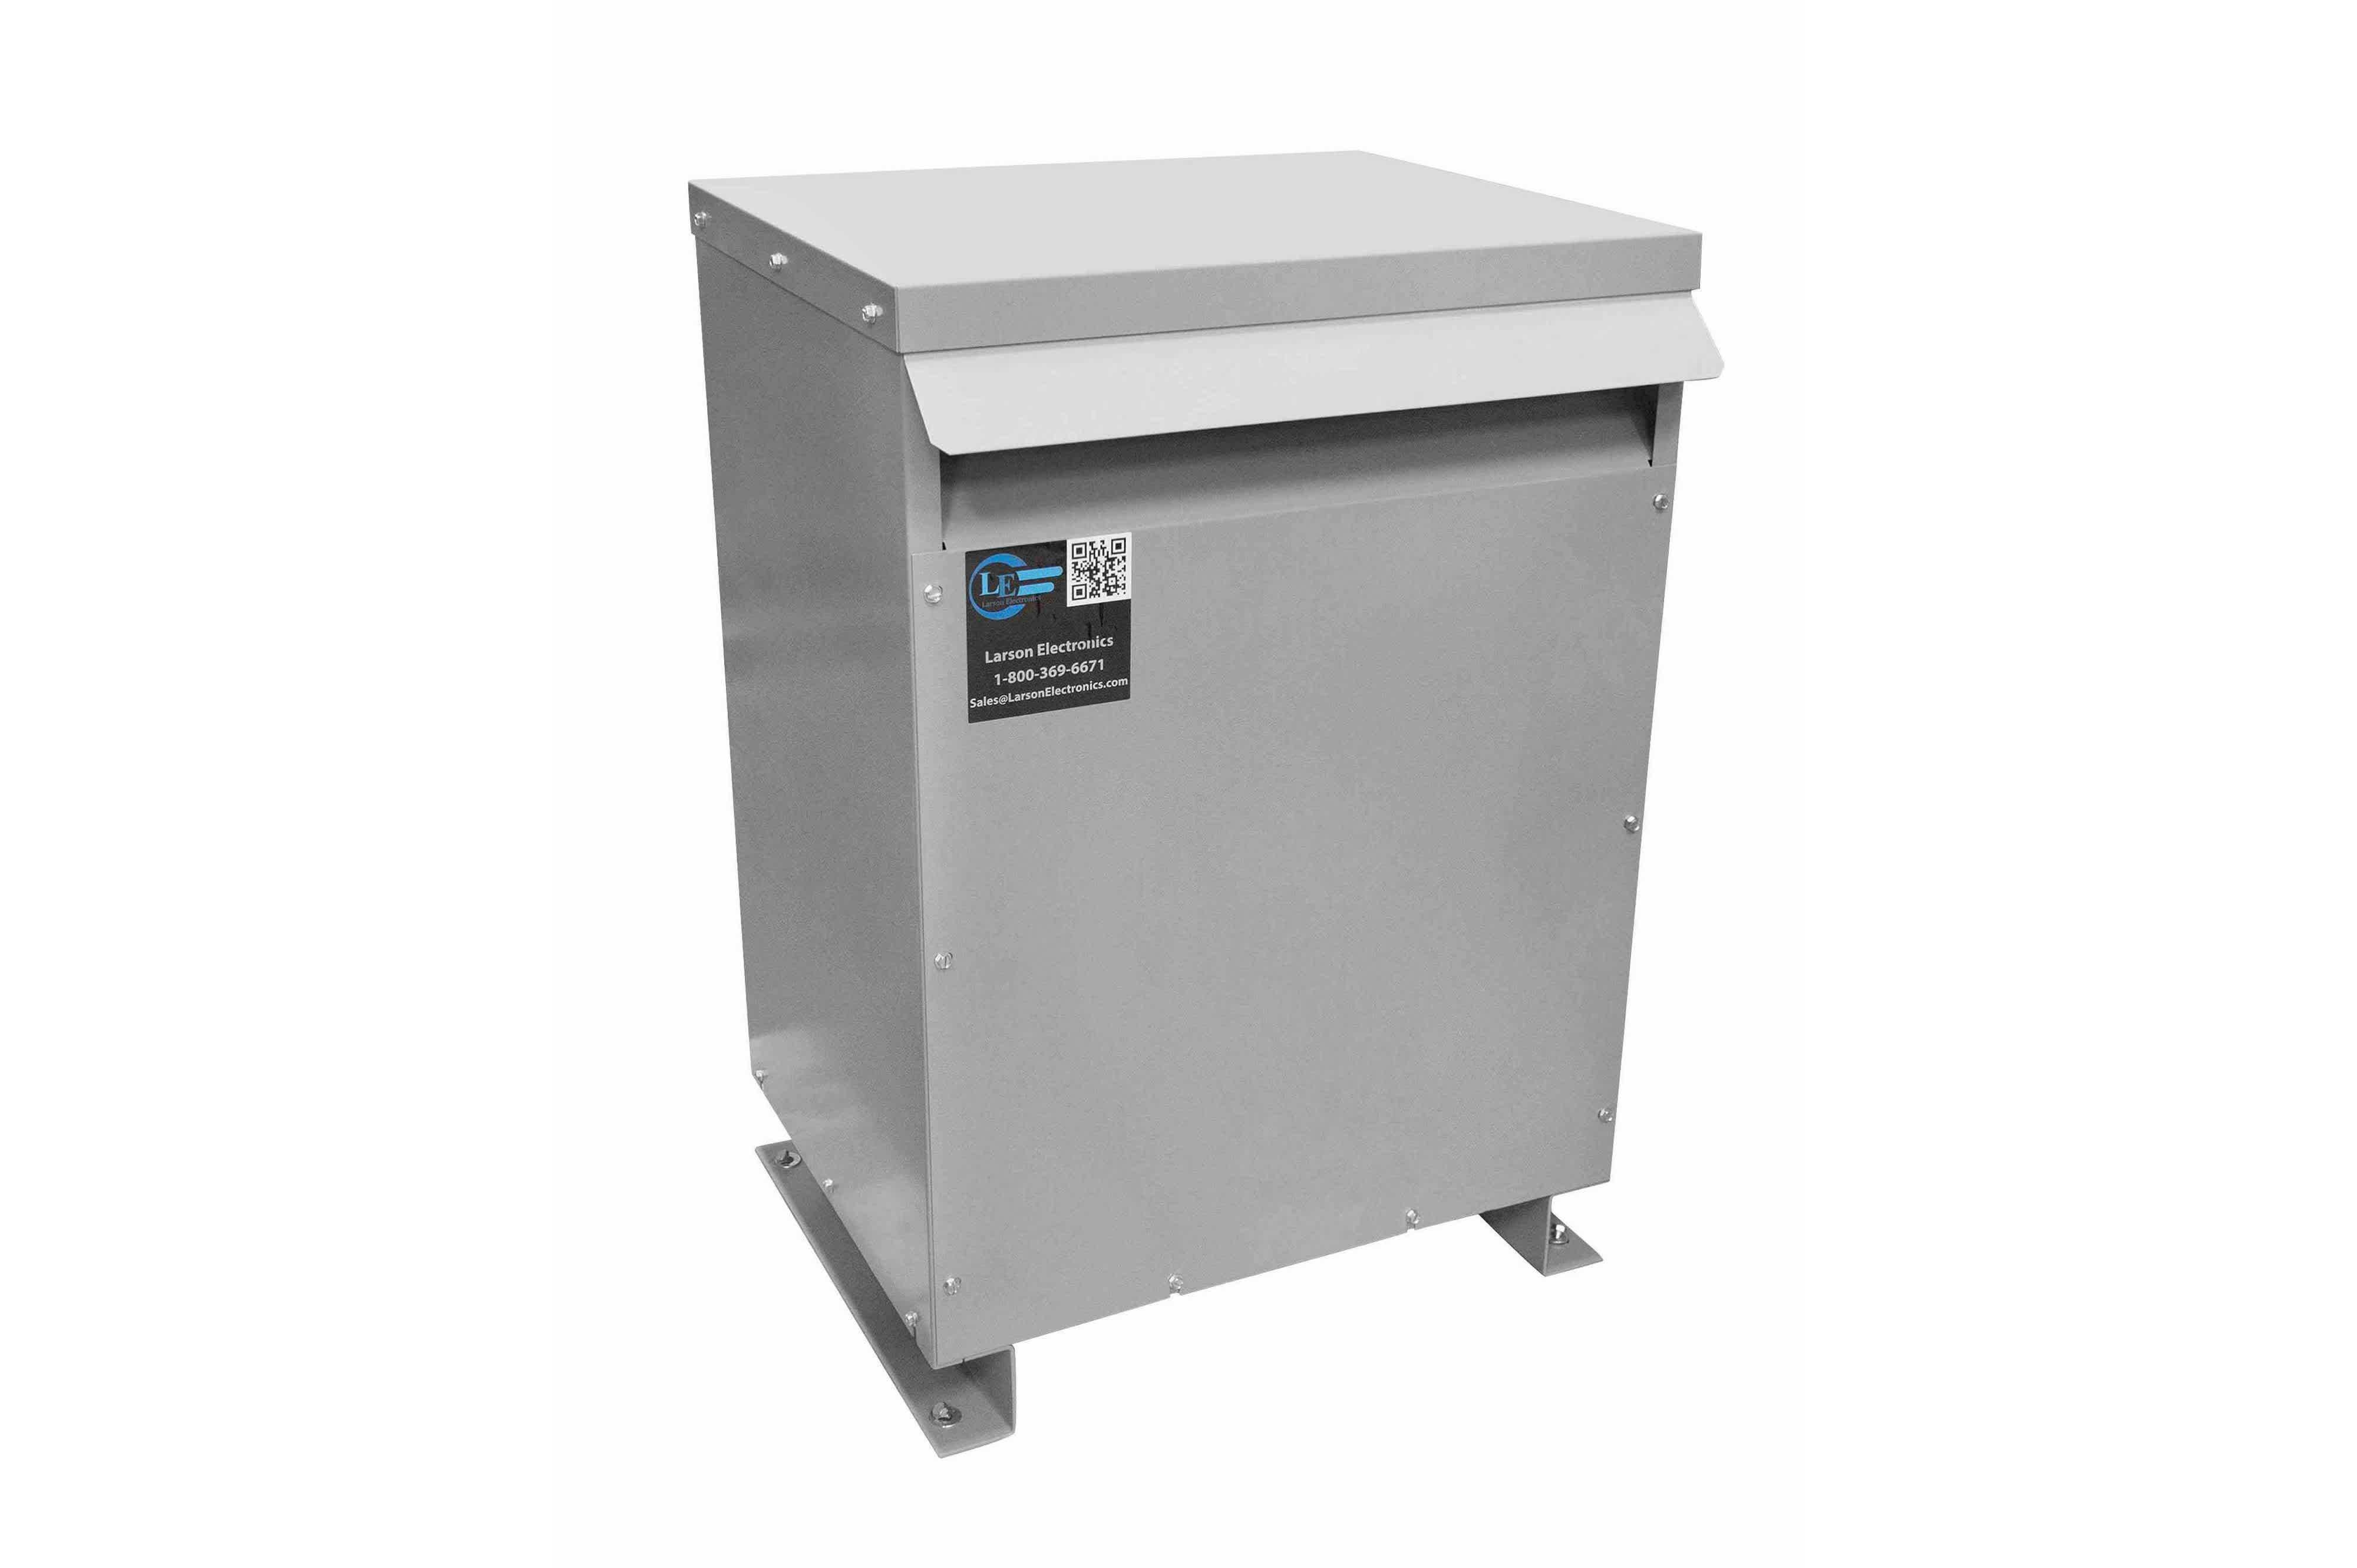 52.5 kVA 3PH Isolation Transformer, 600V Wye Primary, 380V Delta Secondary, N3R, Ventilated, 60 Hz